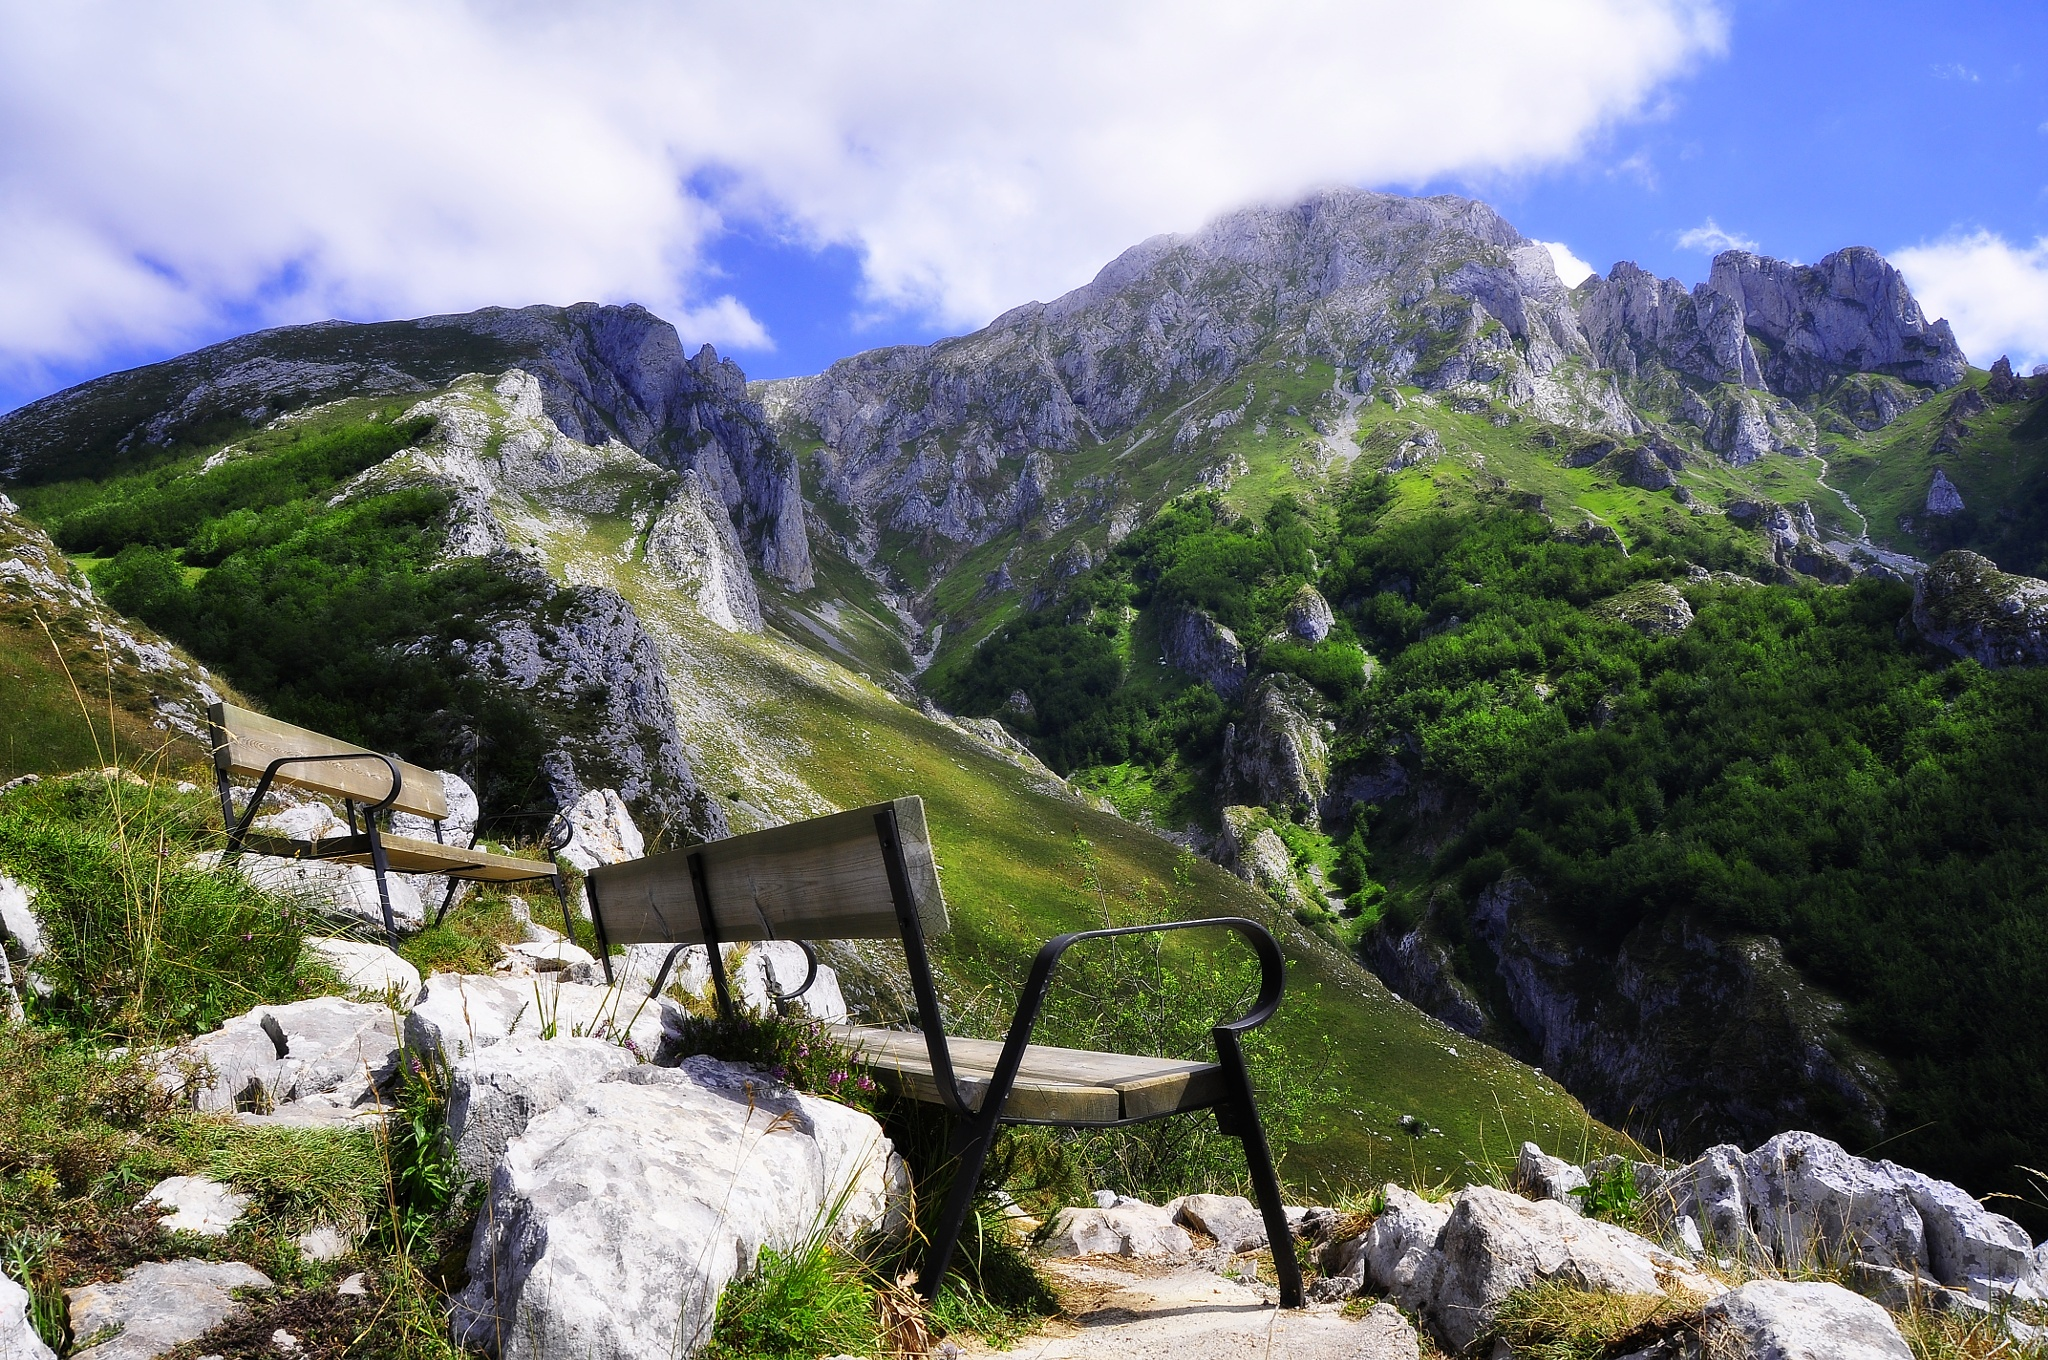 asturias  picos de europa by angelgarcia